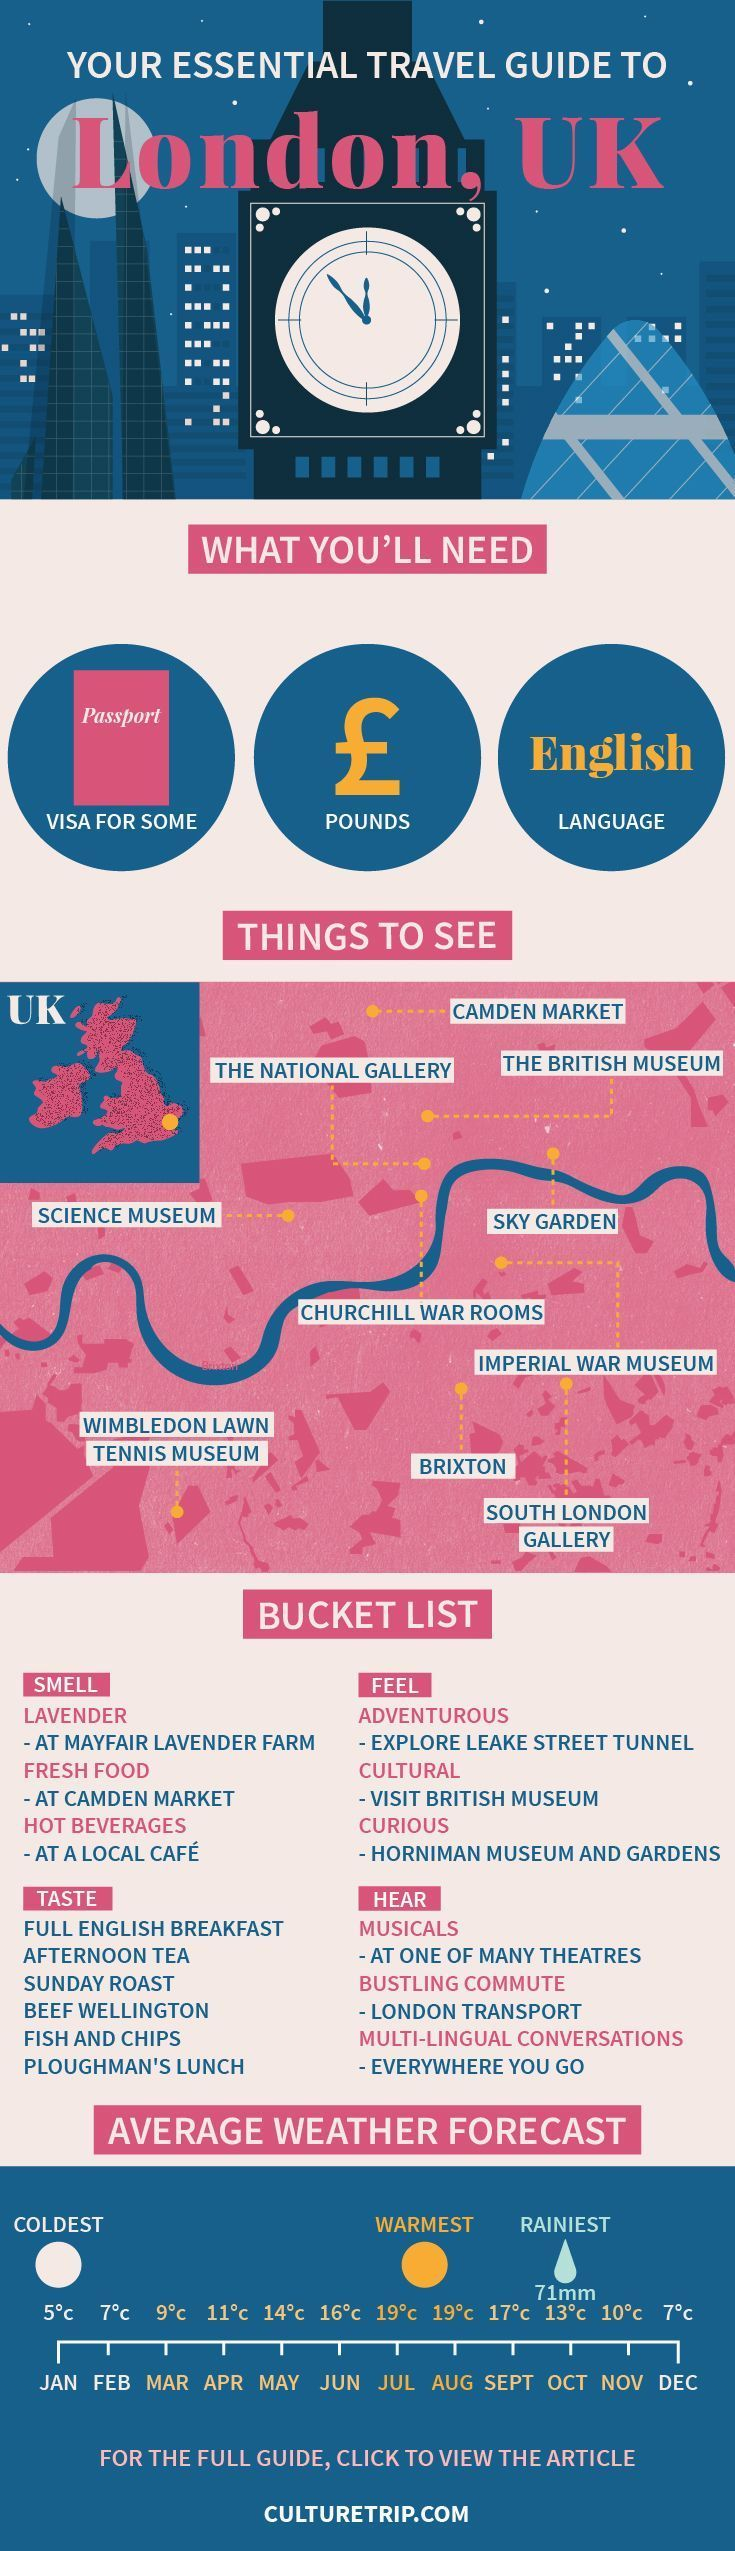 Your Essential Travel Guide to London (Infographic) | London, England, weekend break, Europe, bucket list, wanderlust, adventure, challenge, coffee, bar, food, must try, Summer, United Kingdom, UK #site:eutravel.site #SummerBucketList